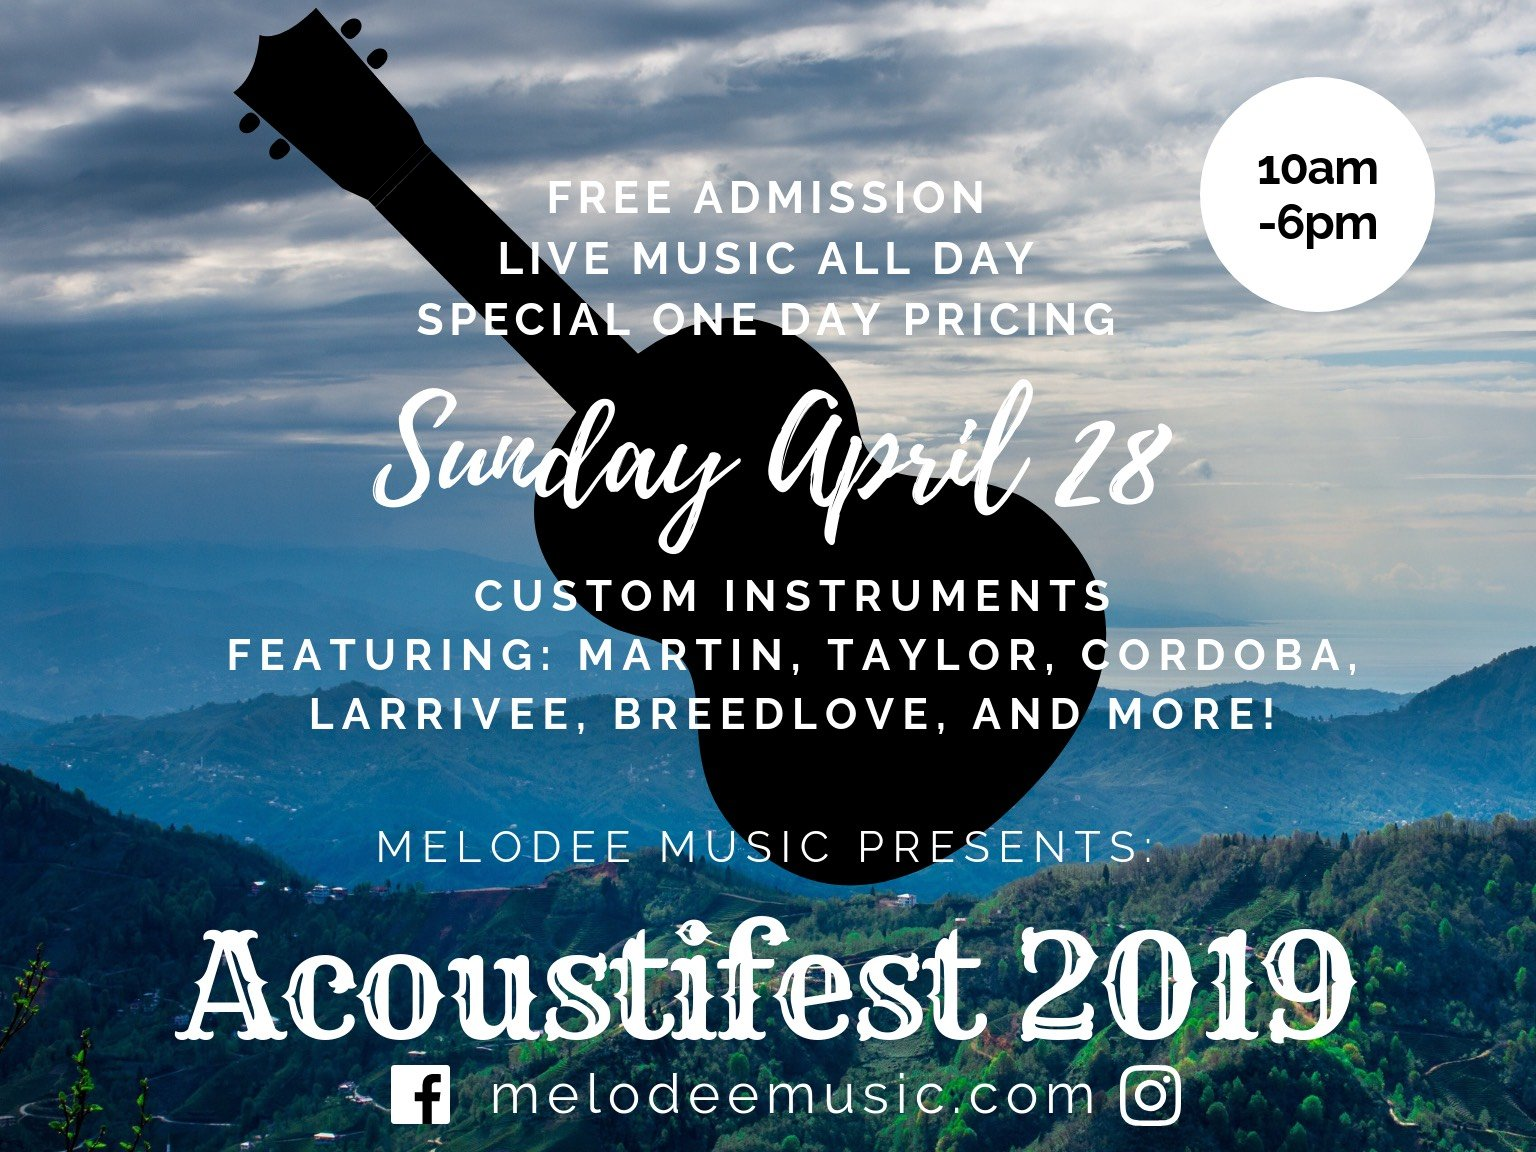 Acoustifest 2019